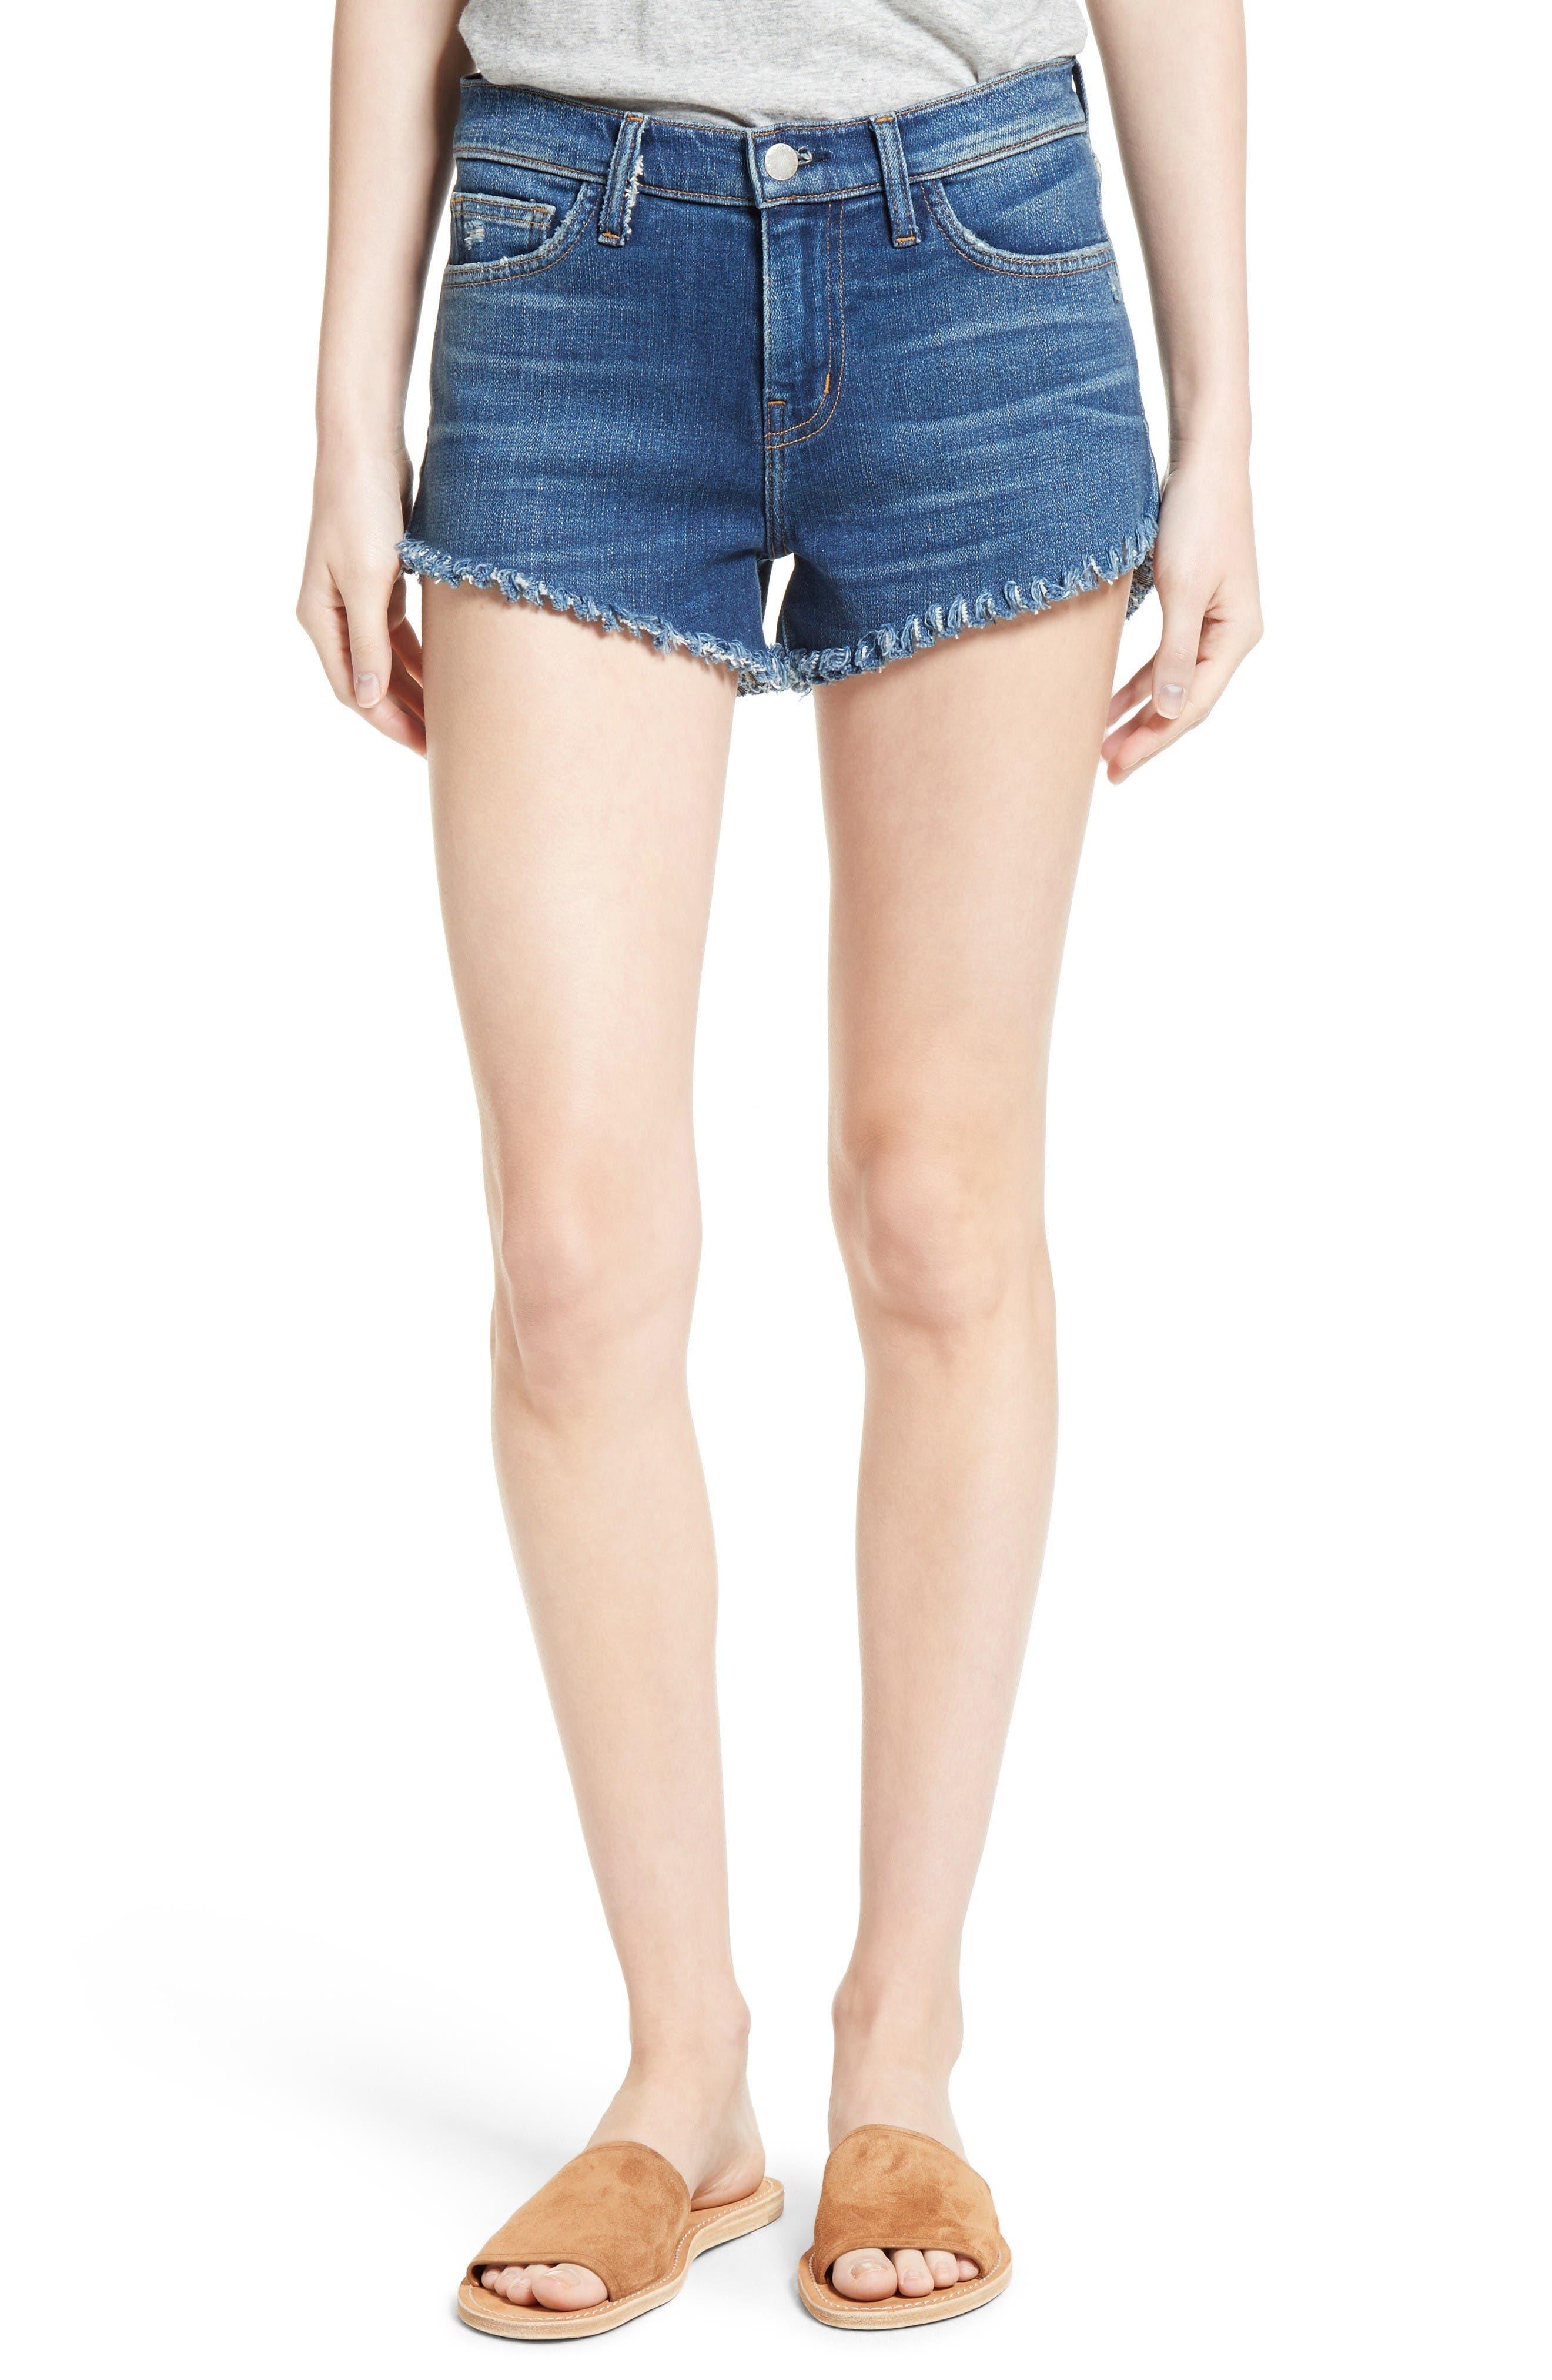 L'AGENCE The Perfect Fit Denim Shorts (Authentique)